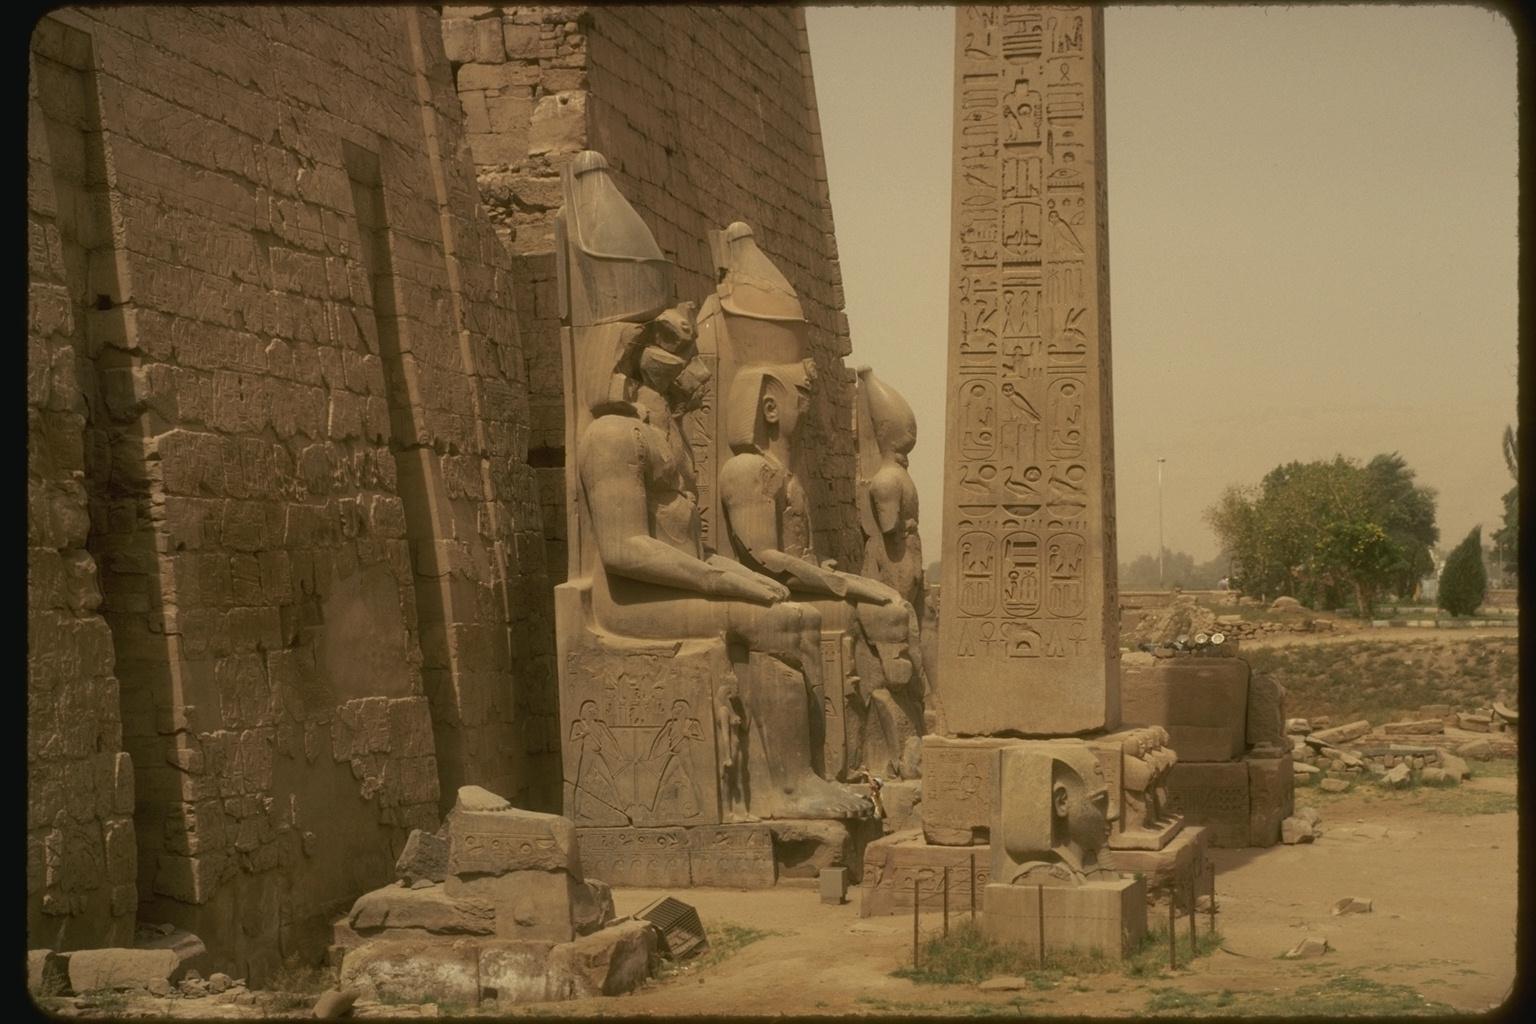 http://3.bp.blogspot.com/-mQU2nVPWAsY/TfiqbBUodkI/AAAAAAAAAWI/w-acOzqslK0/s1600/Egypt+Pyramids+%252830%2529.JPG